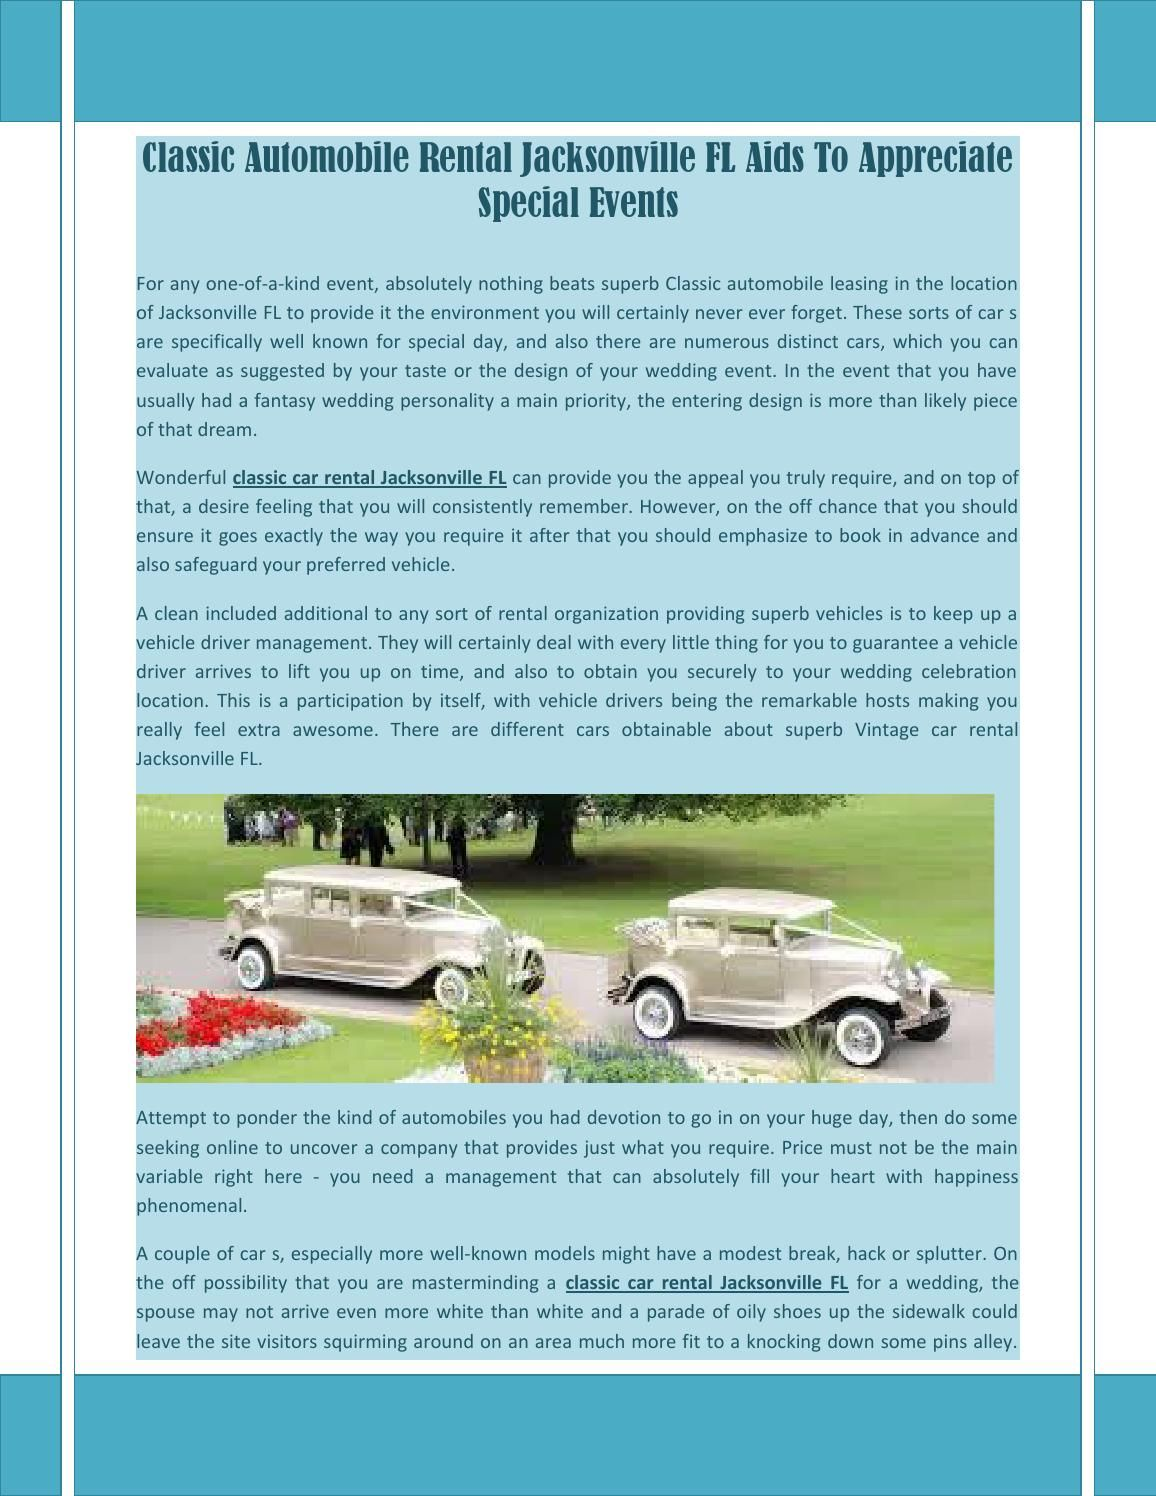 Pin On Classic Car Rental Jacksonville Fl